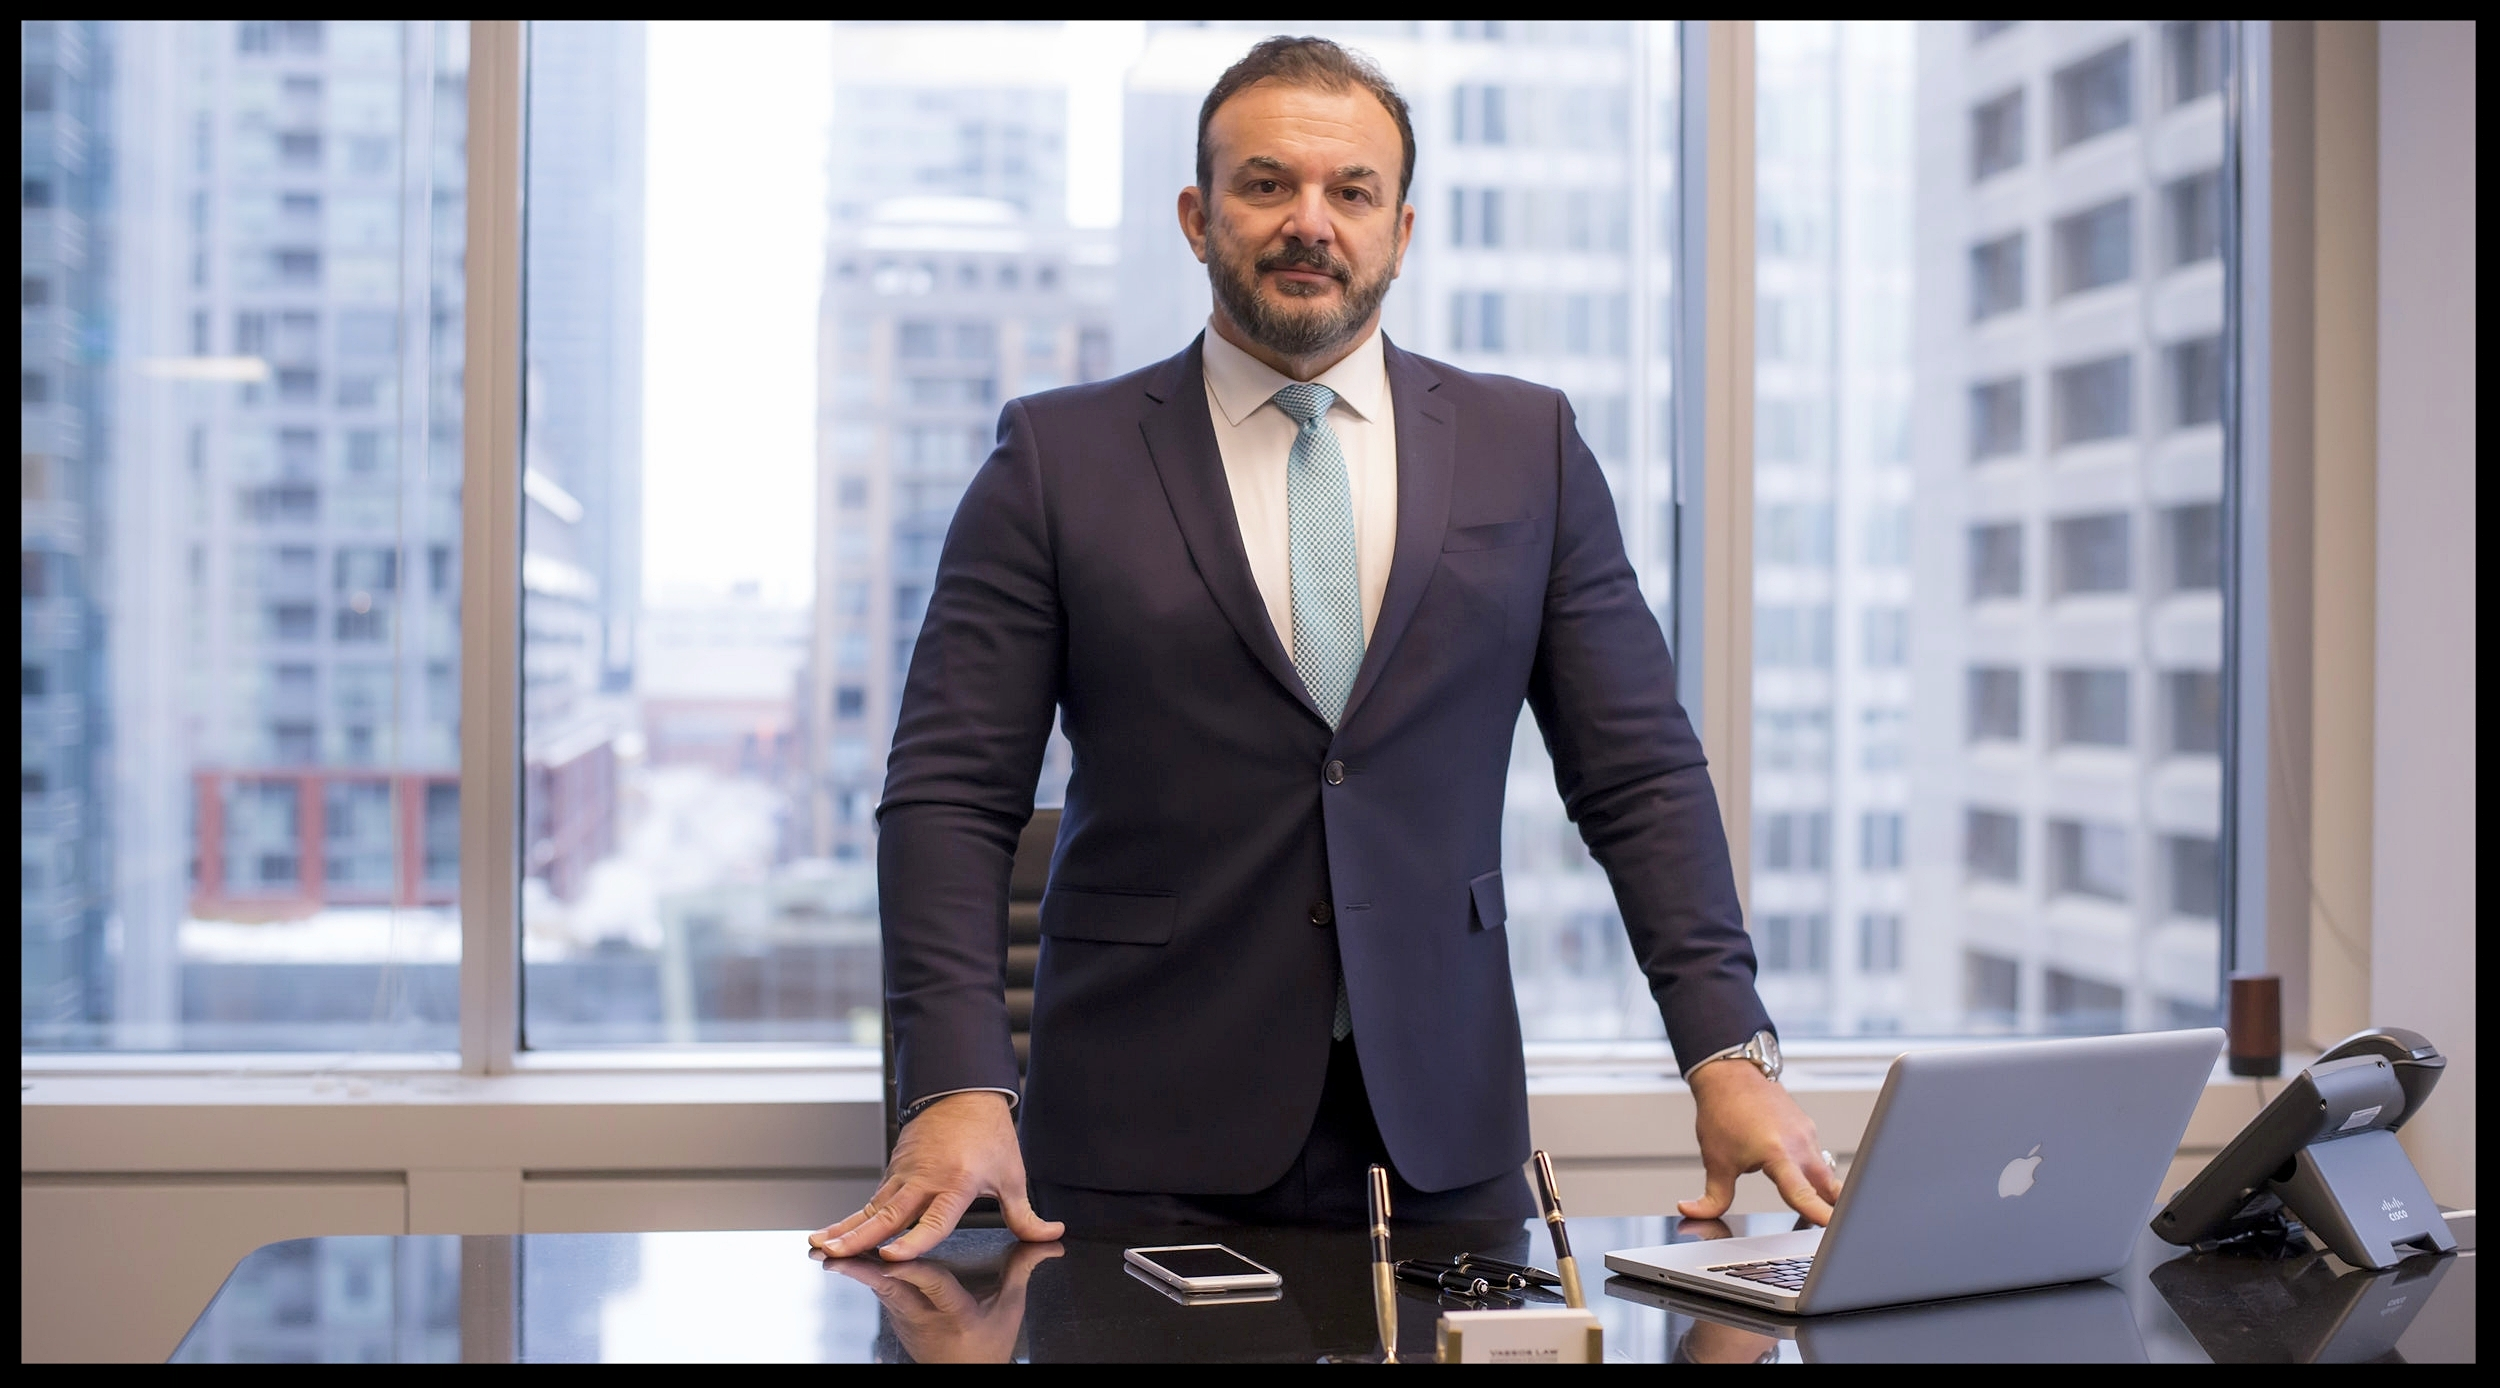 Senior Counsel & Founder - Adam M. Vassosadam@vassoslaw.ca